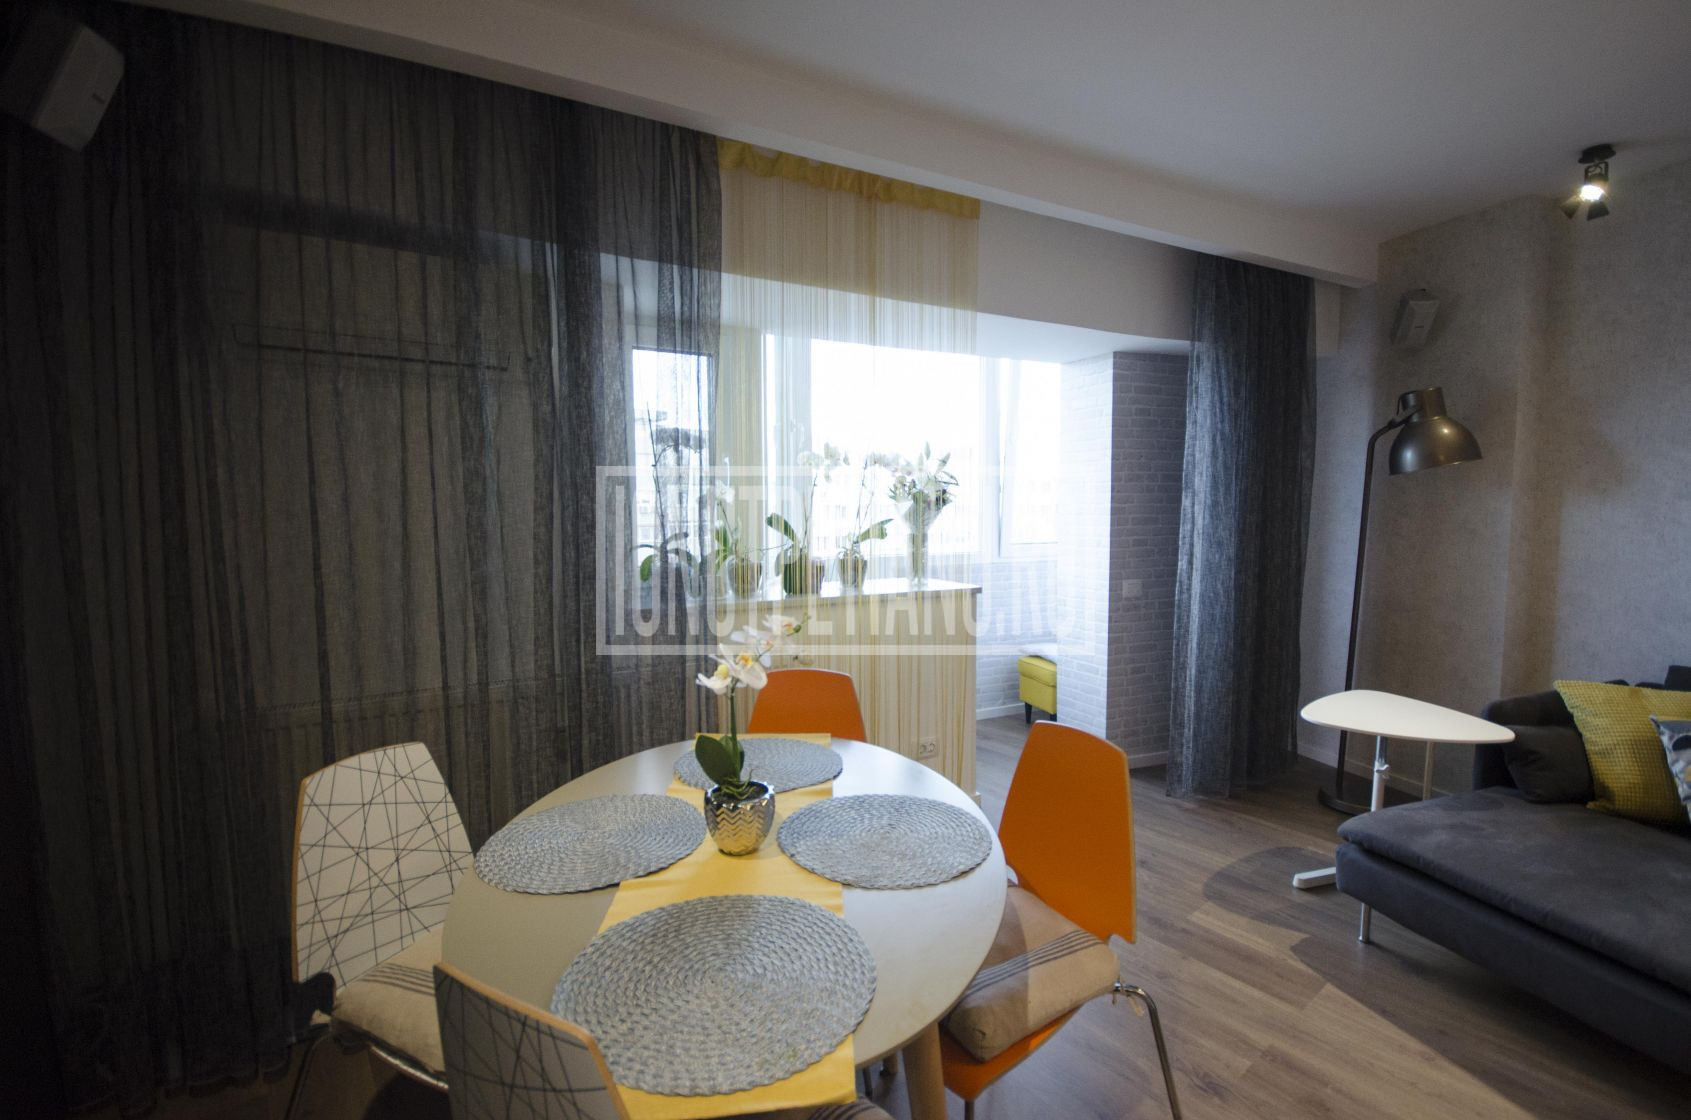 Inchiriere apartament 3 camere langa Piata Victoriei